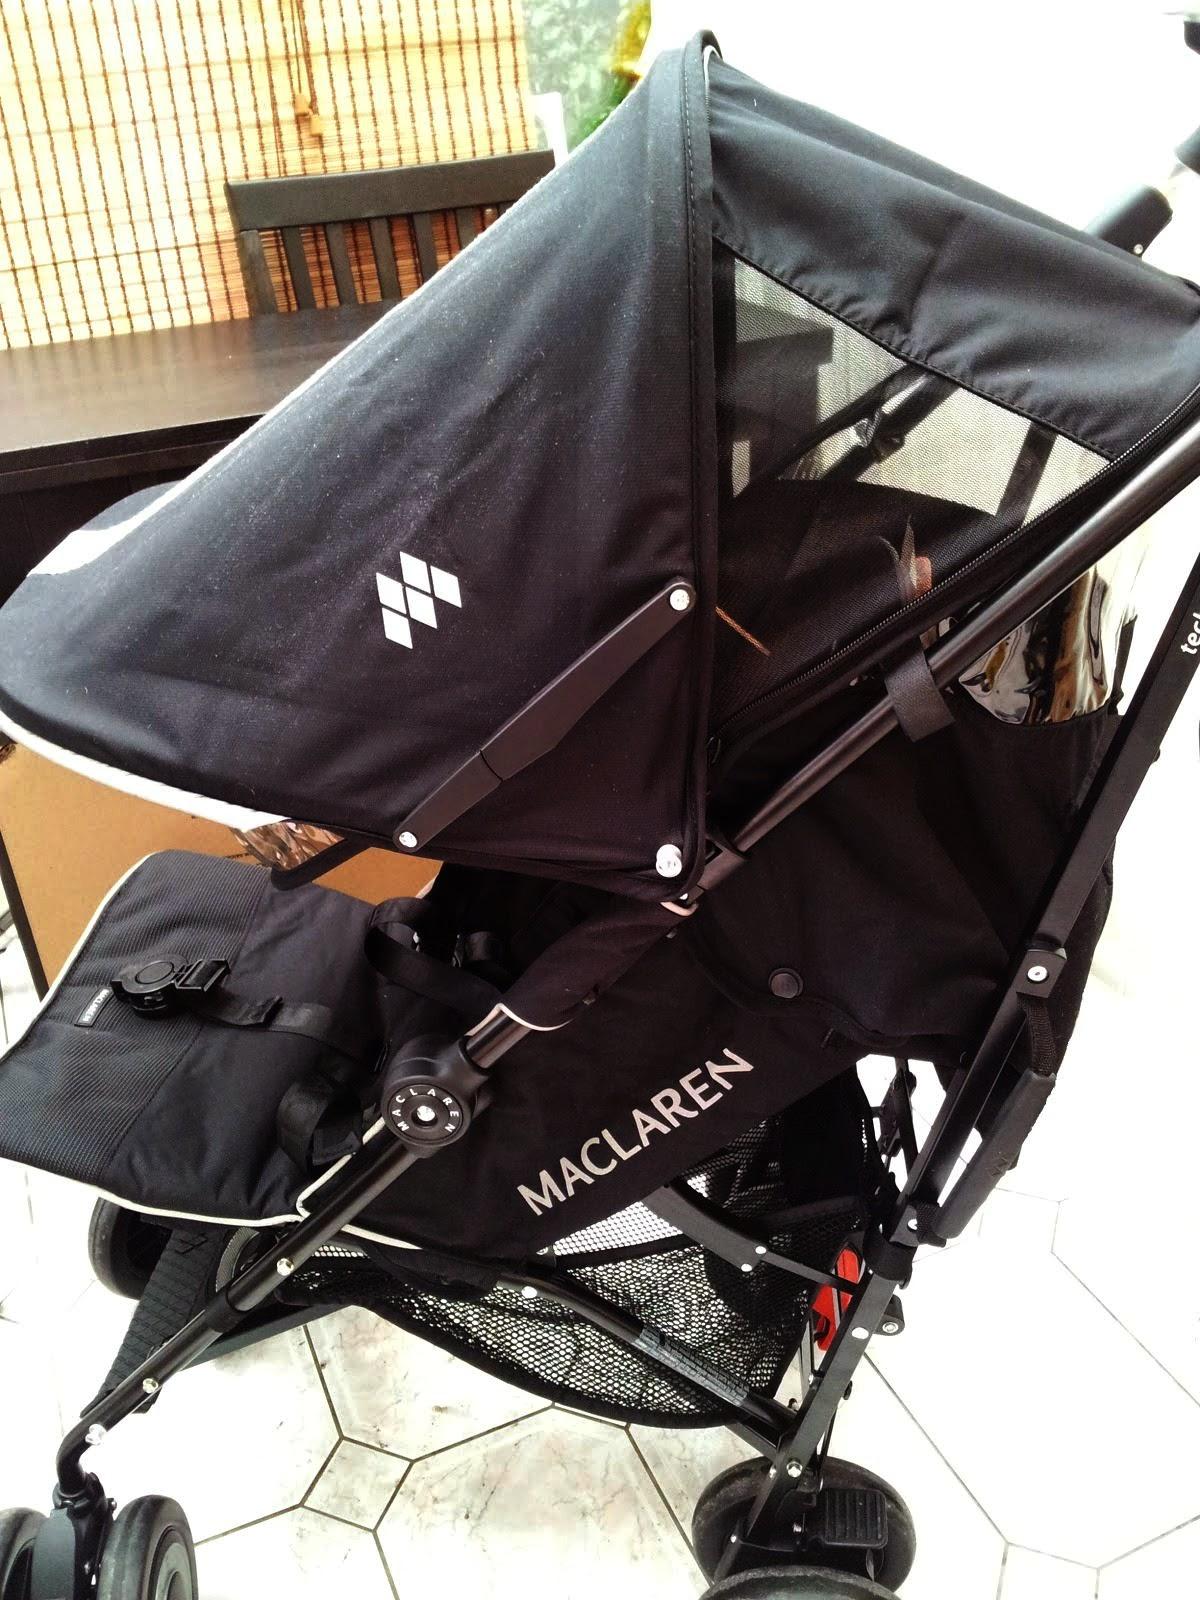 MacLaren Techno XT Stroller, Pushchair